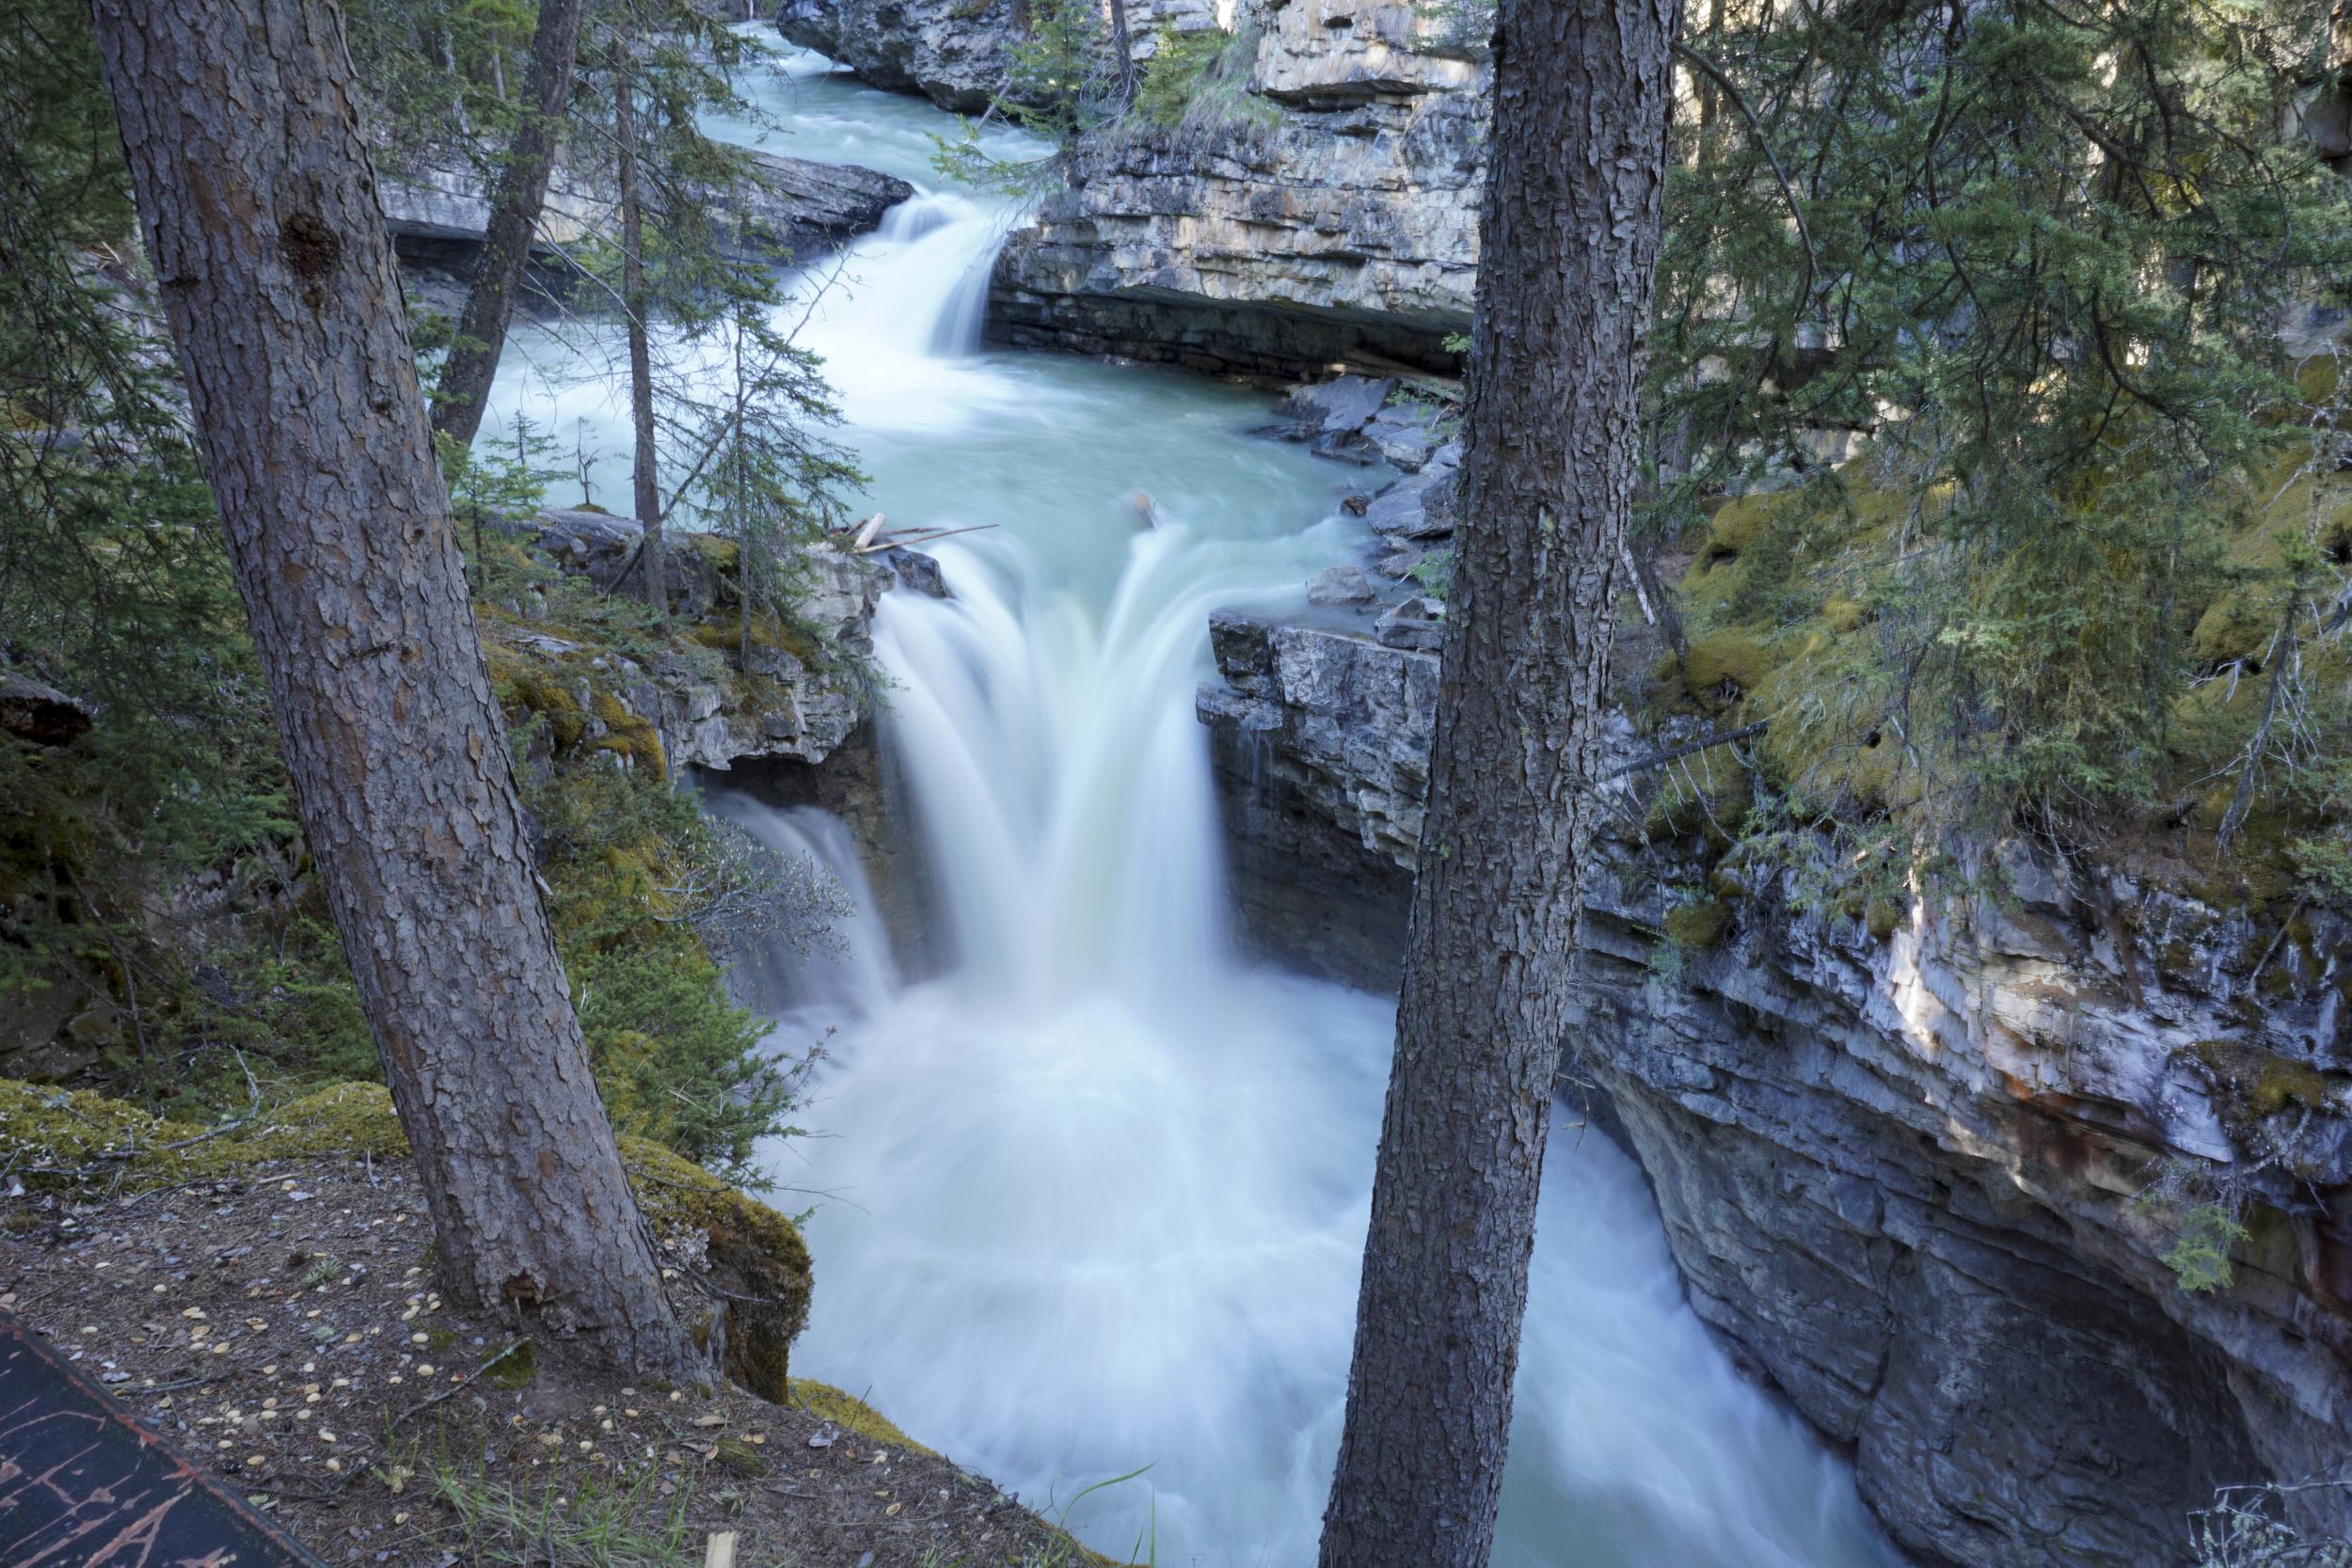 the national parks girl_banff national park_canada_alberta_sonya6000_johnston canyon_long exposureJPG